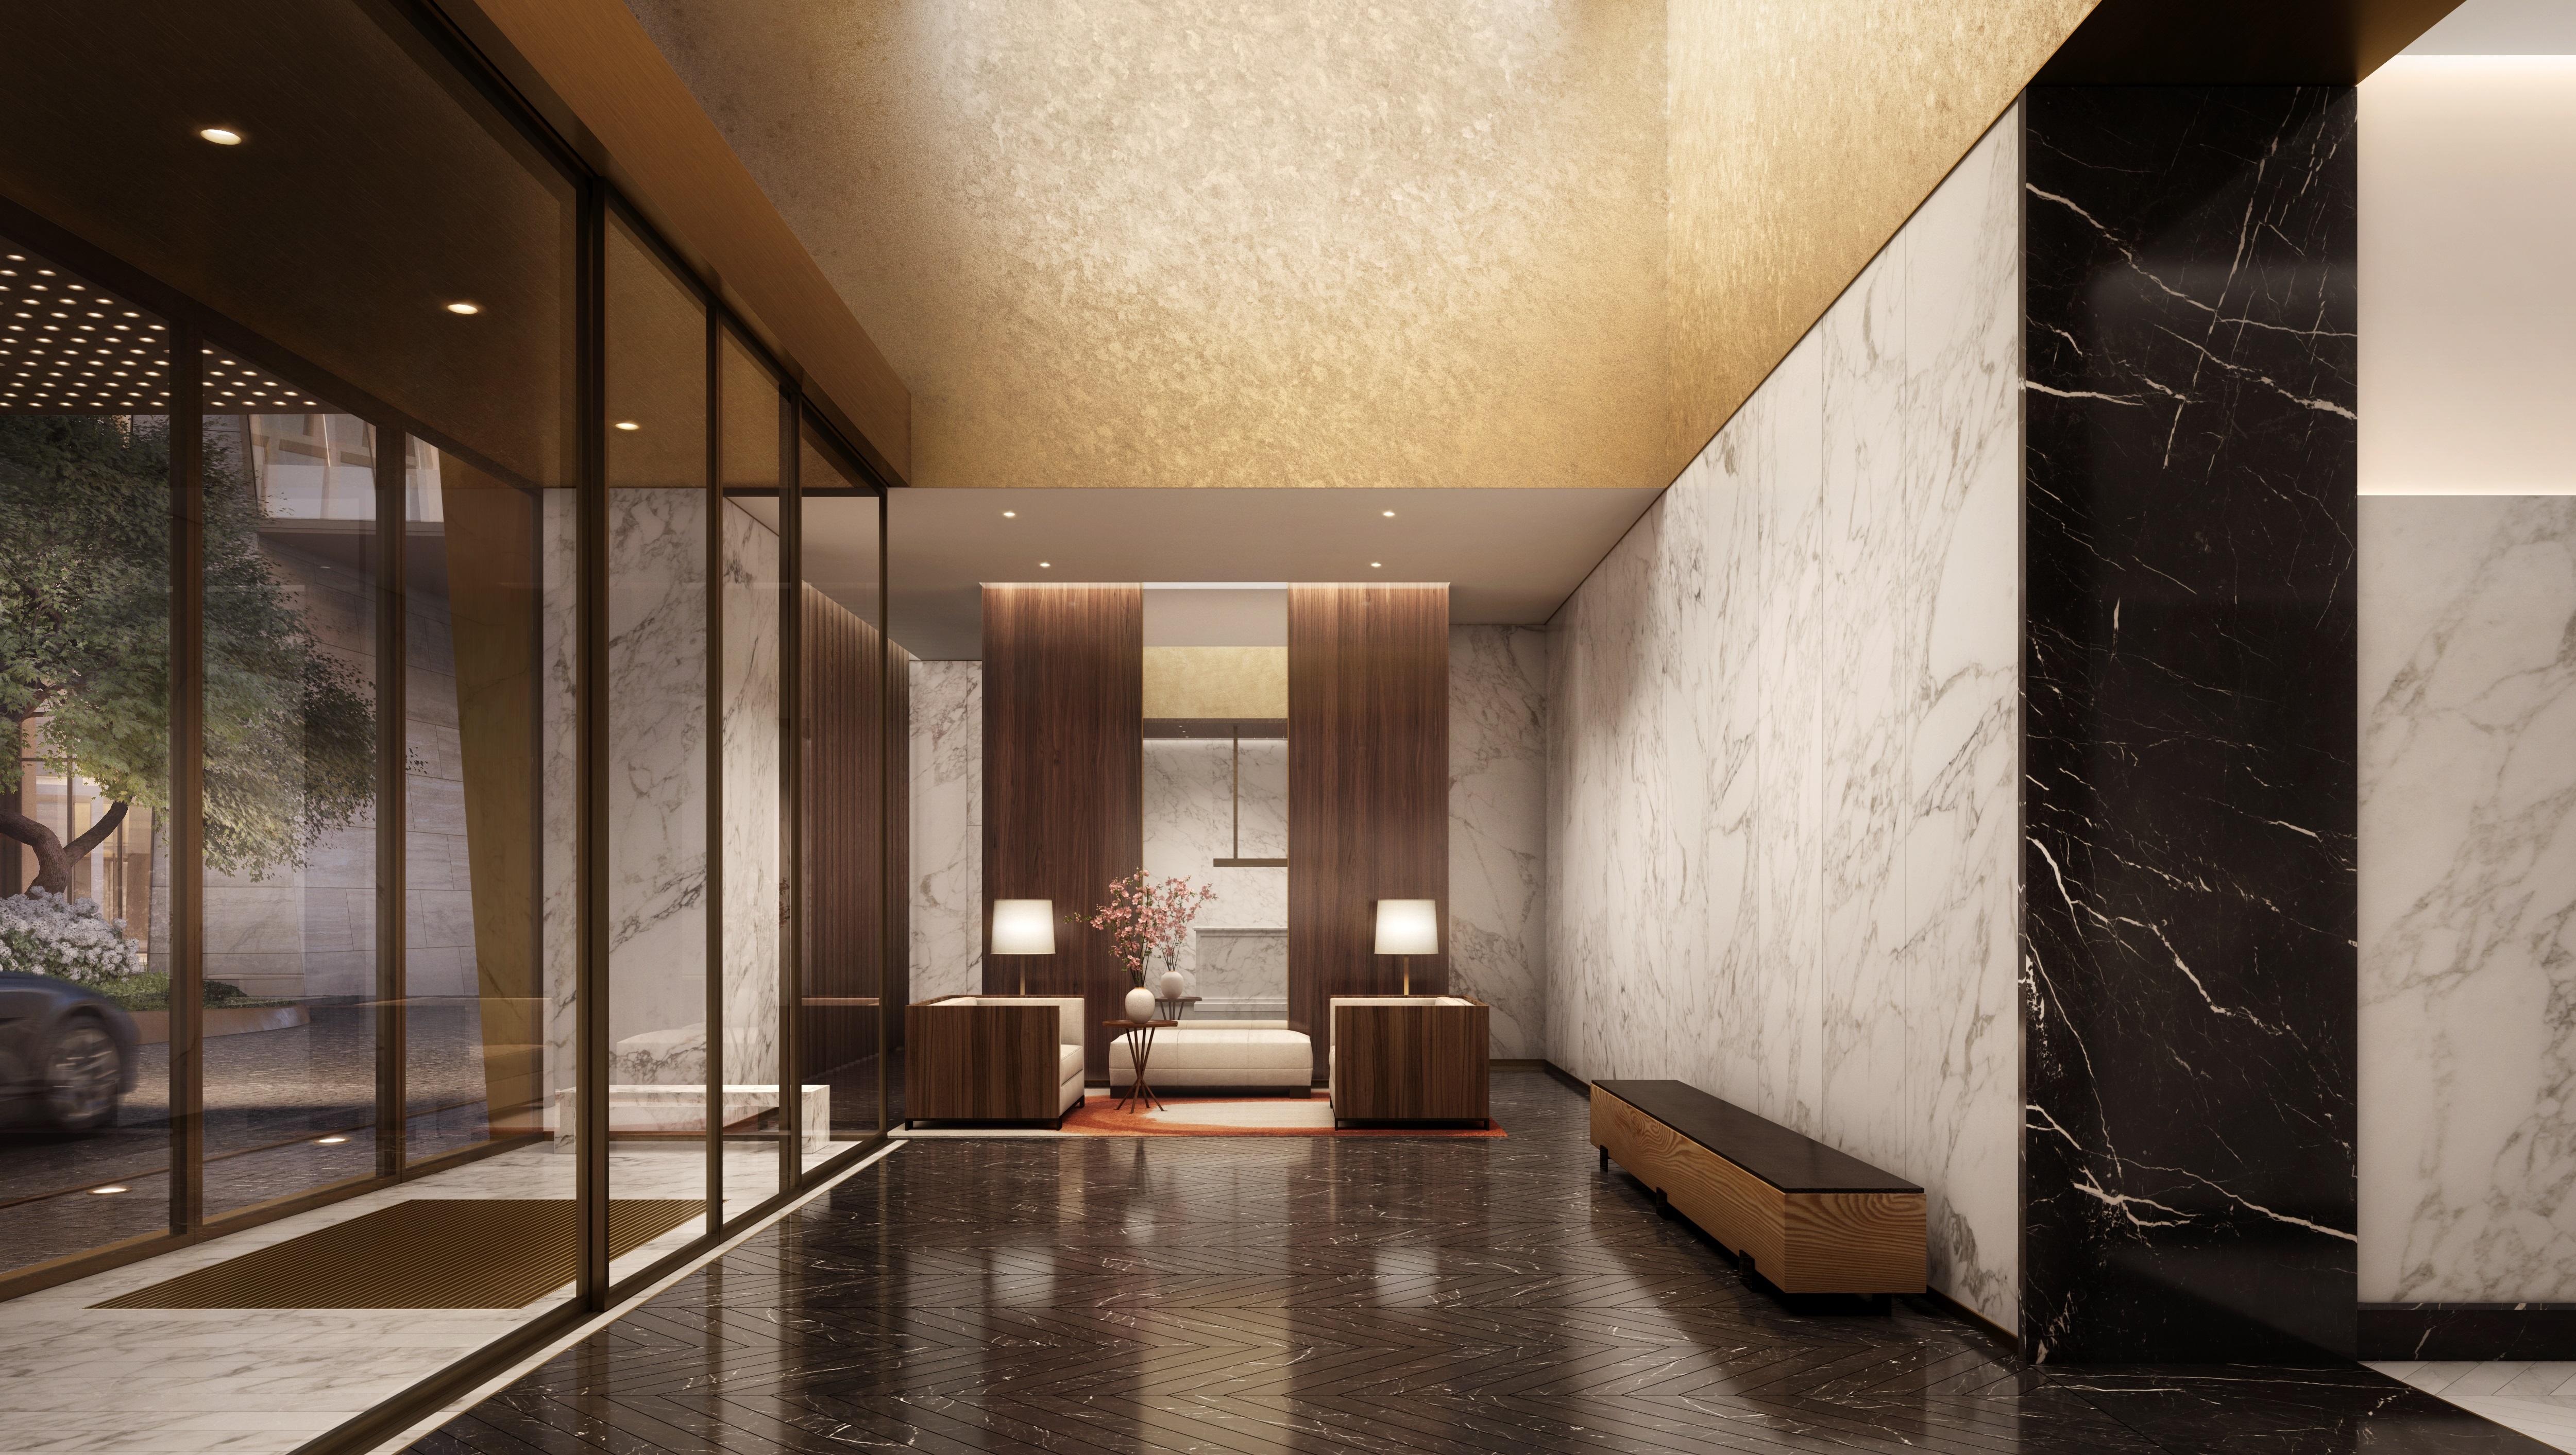 New Marble Clad Interior Renderings Revealed For Bjarke